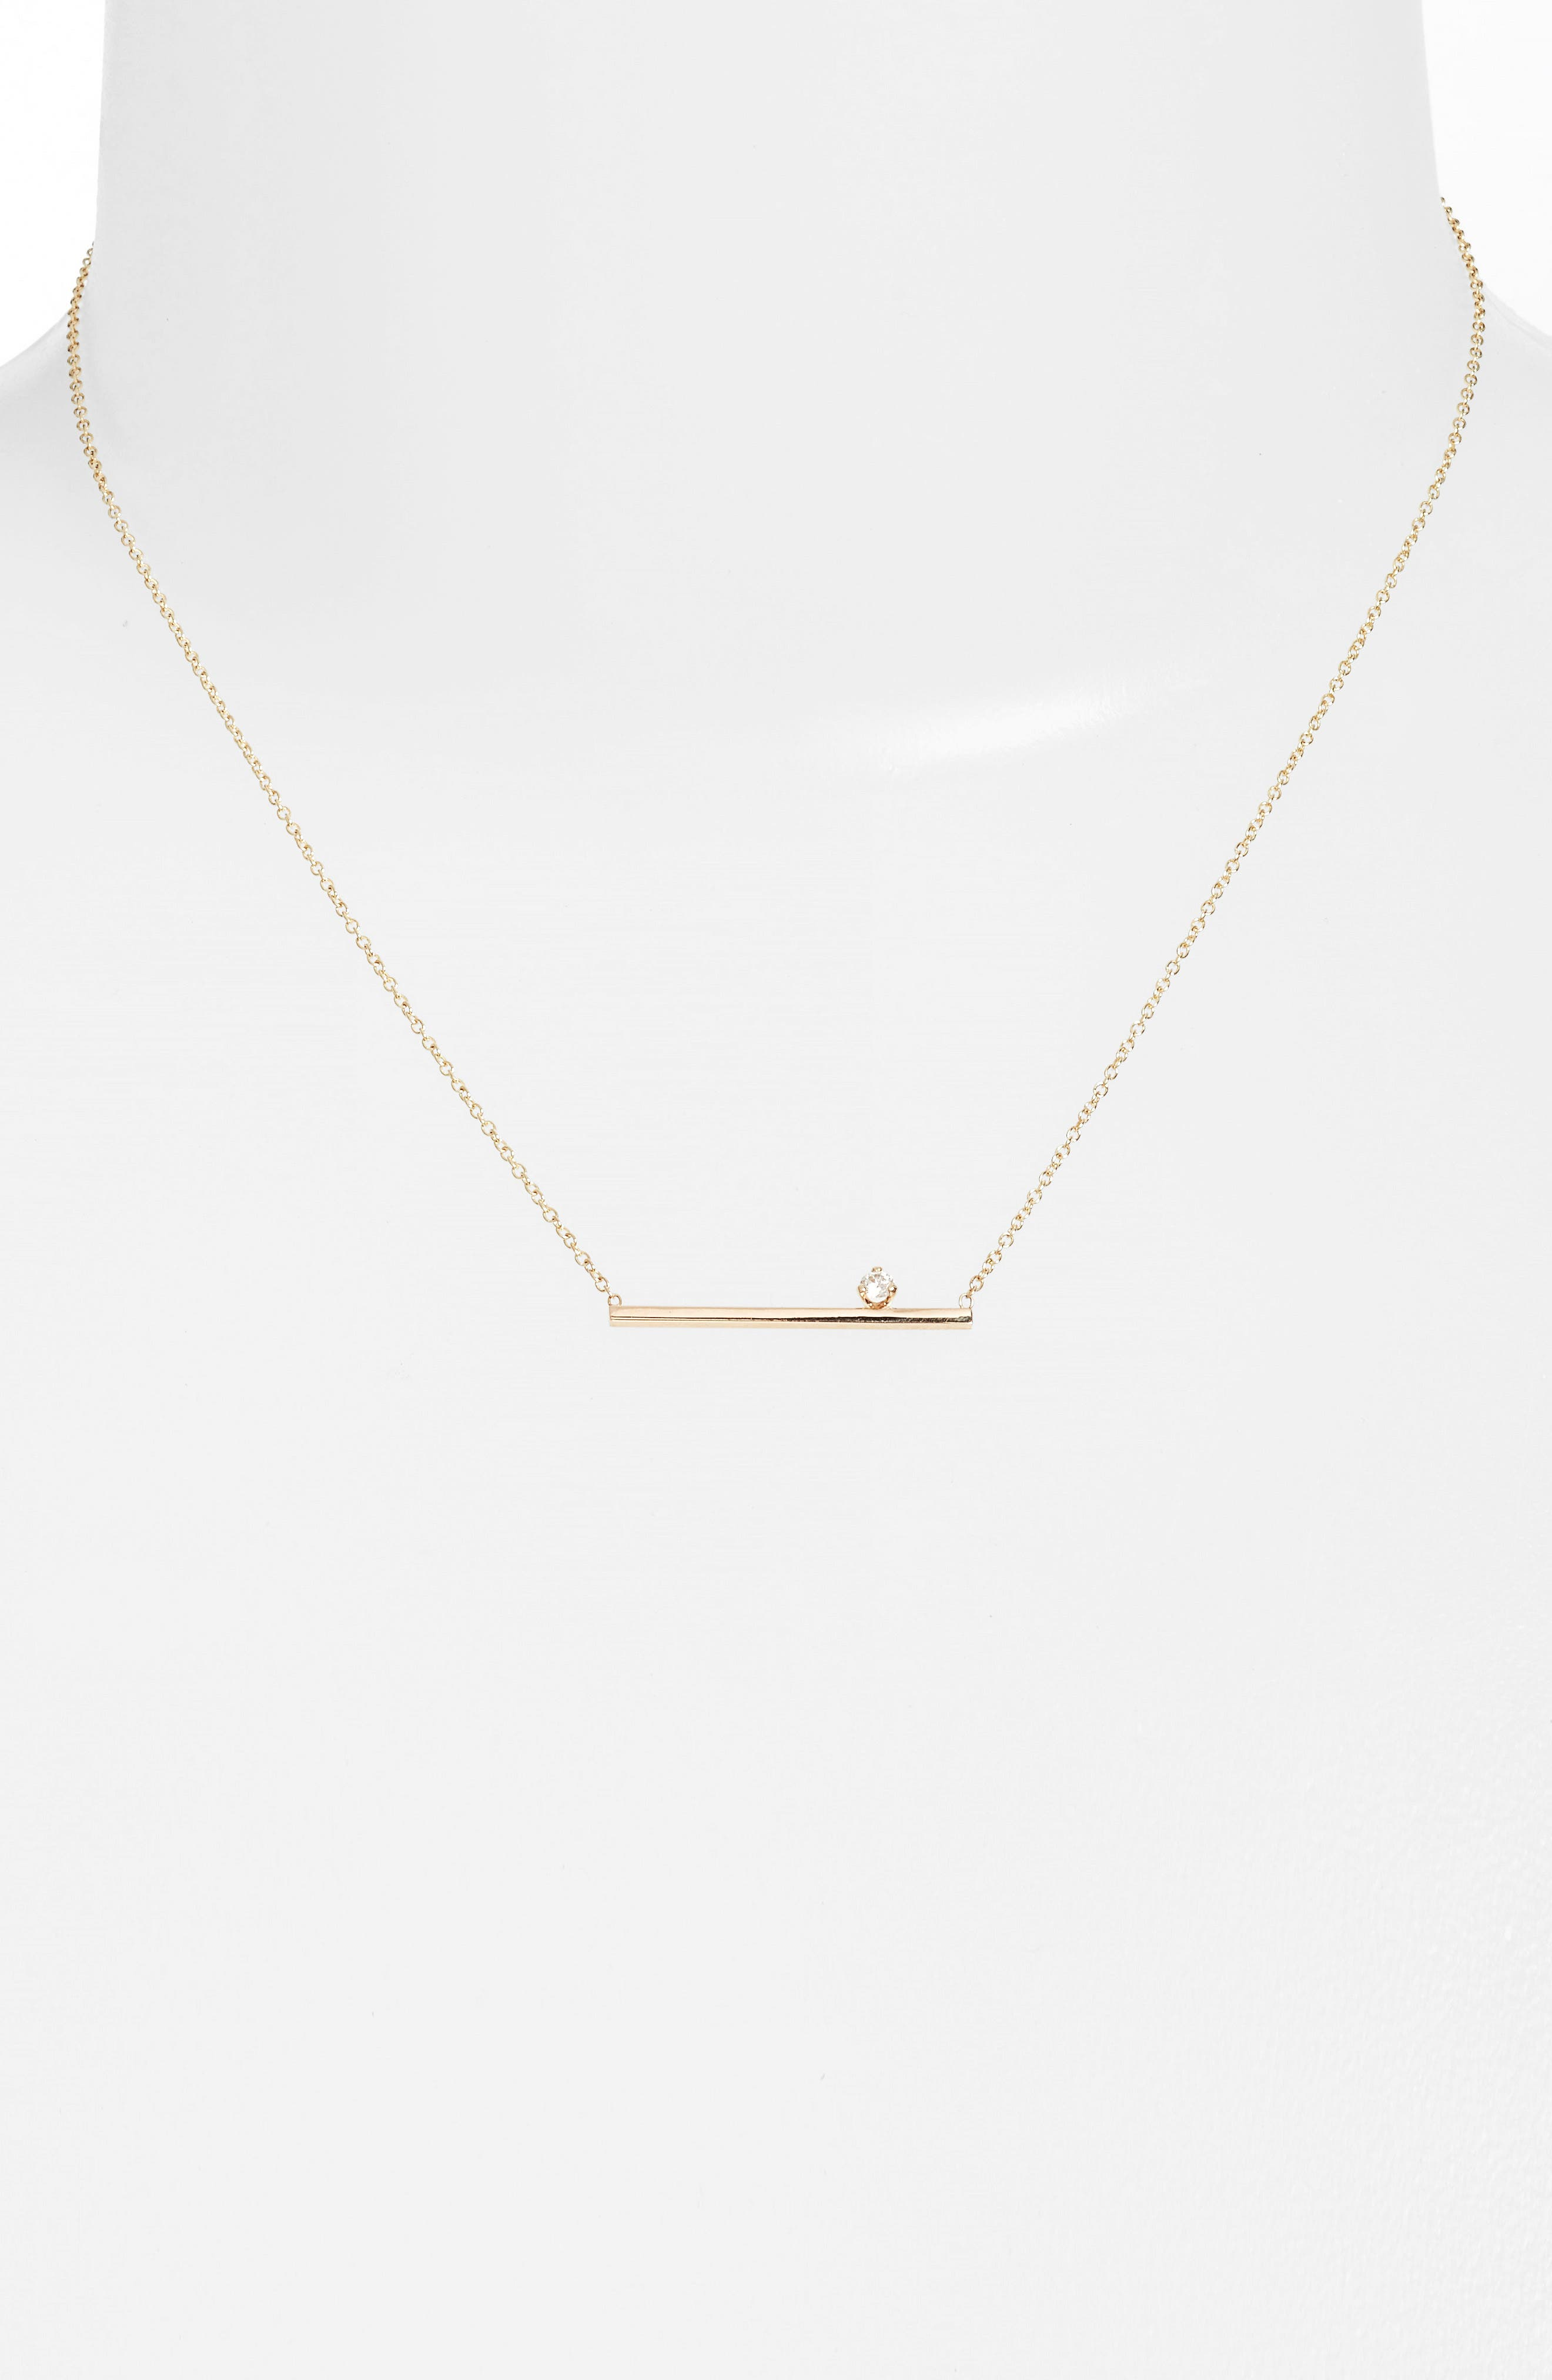 Main Image - Zoë Chicco Floating Diamond Pendant Necklace